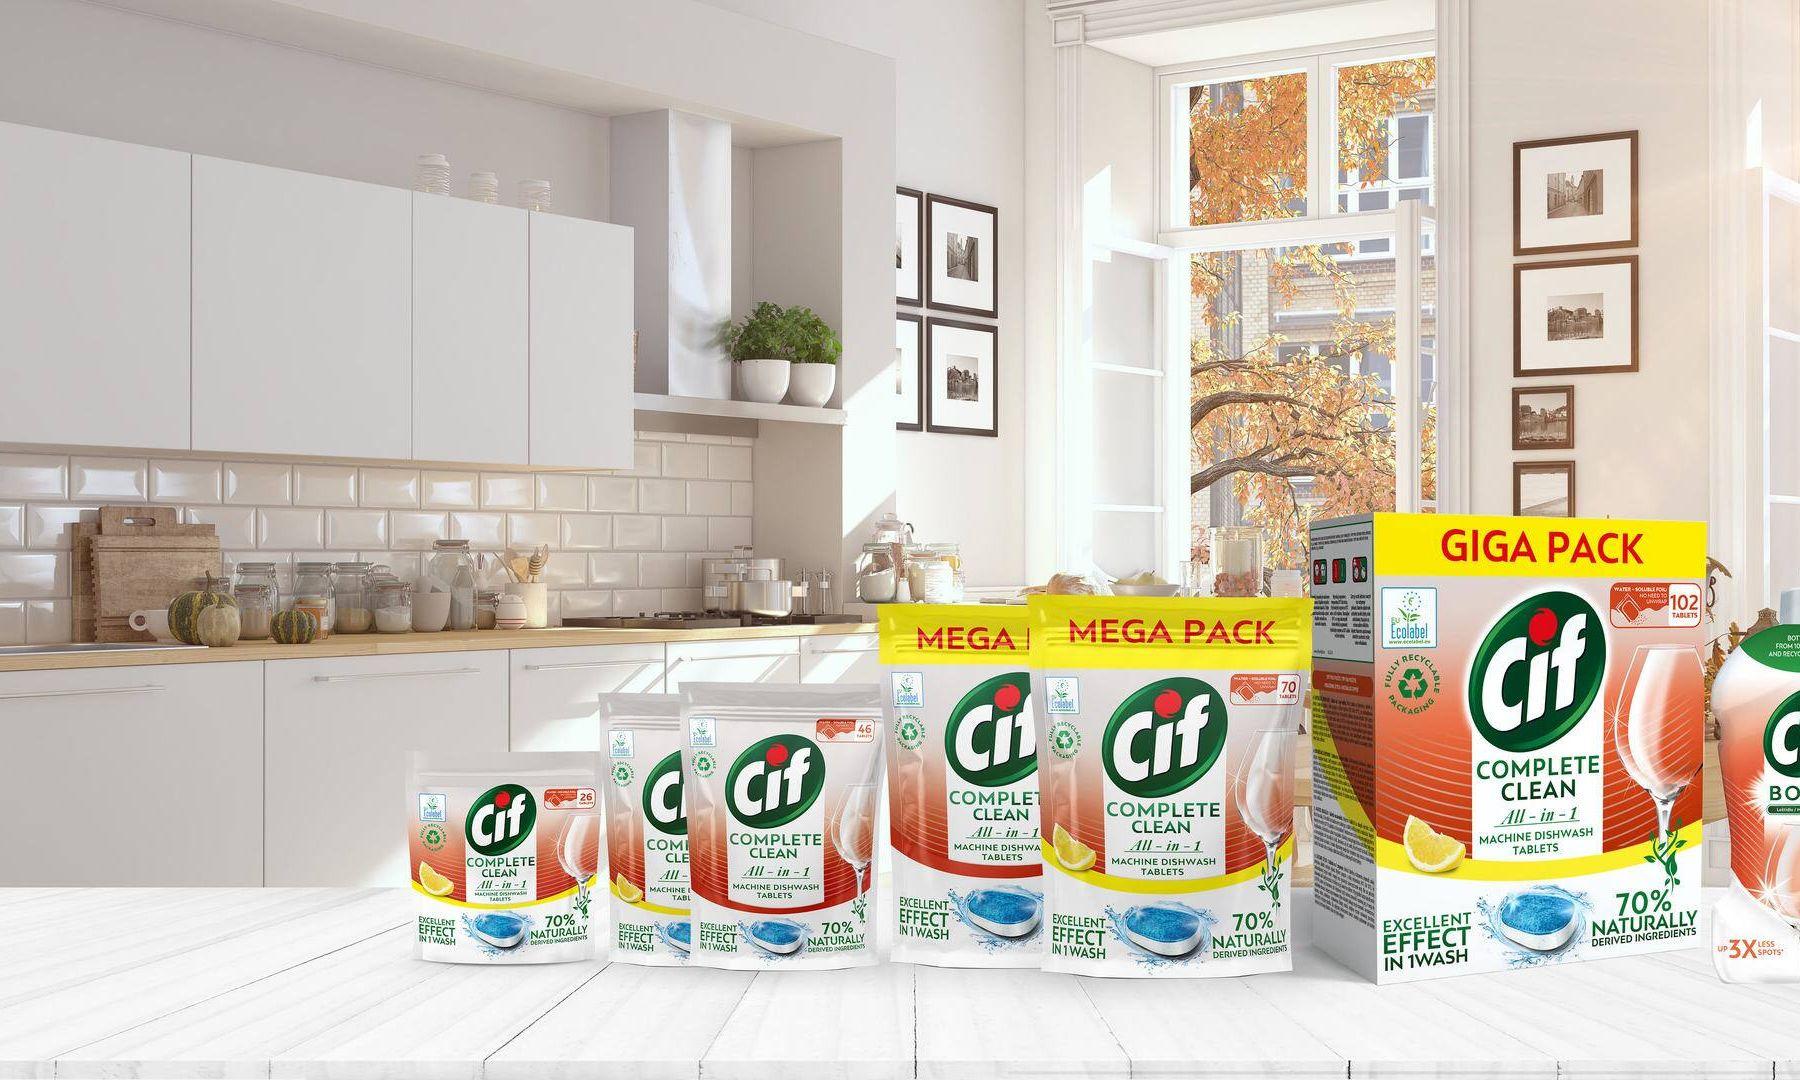 Cif - Čisté nádobí, čistší planeta